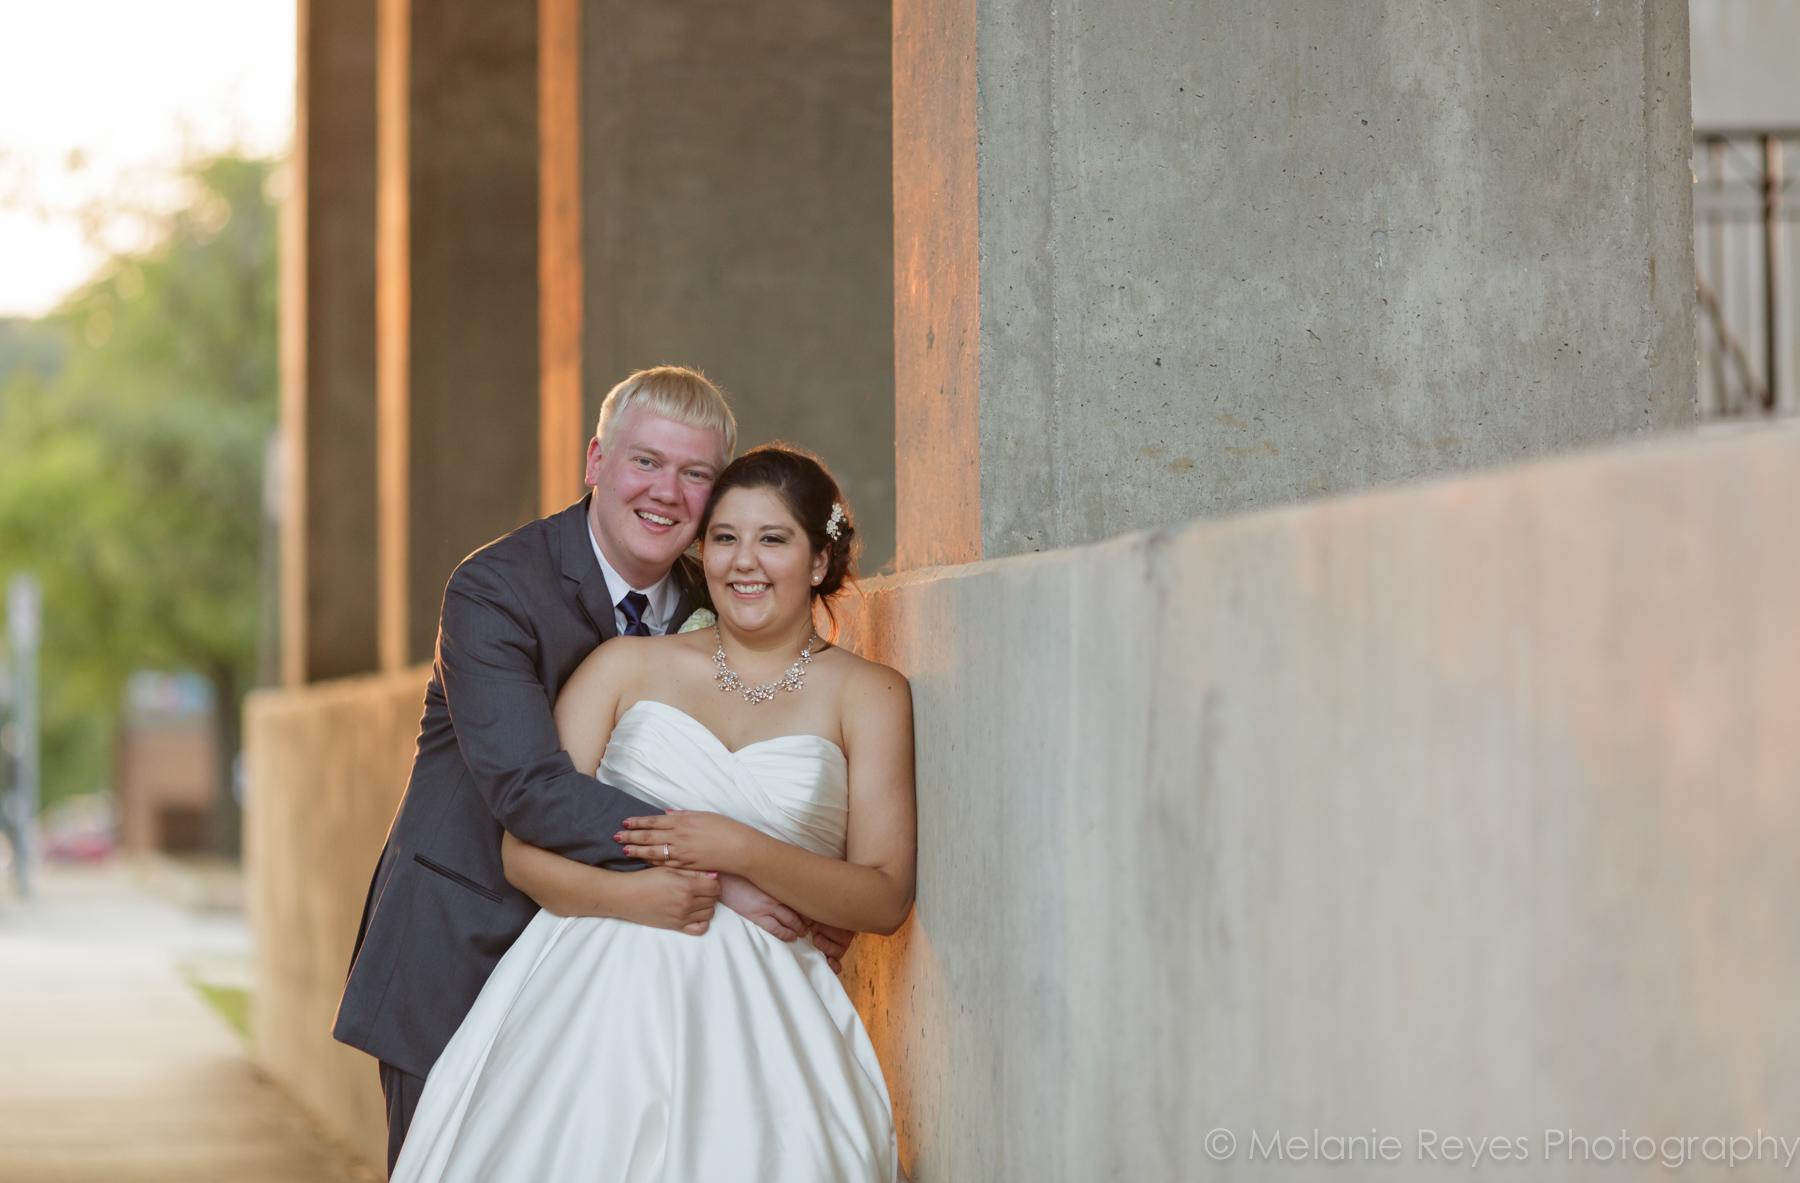 MC_annarbor_uofm_wedding_055